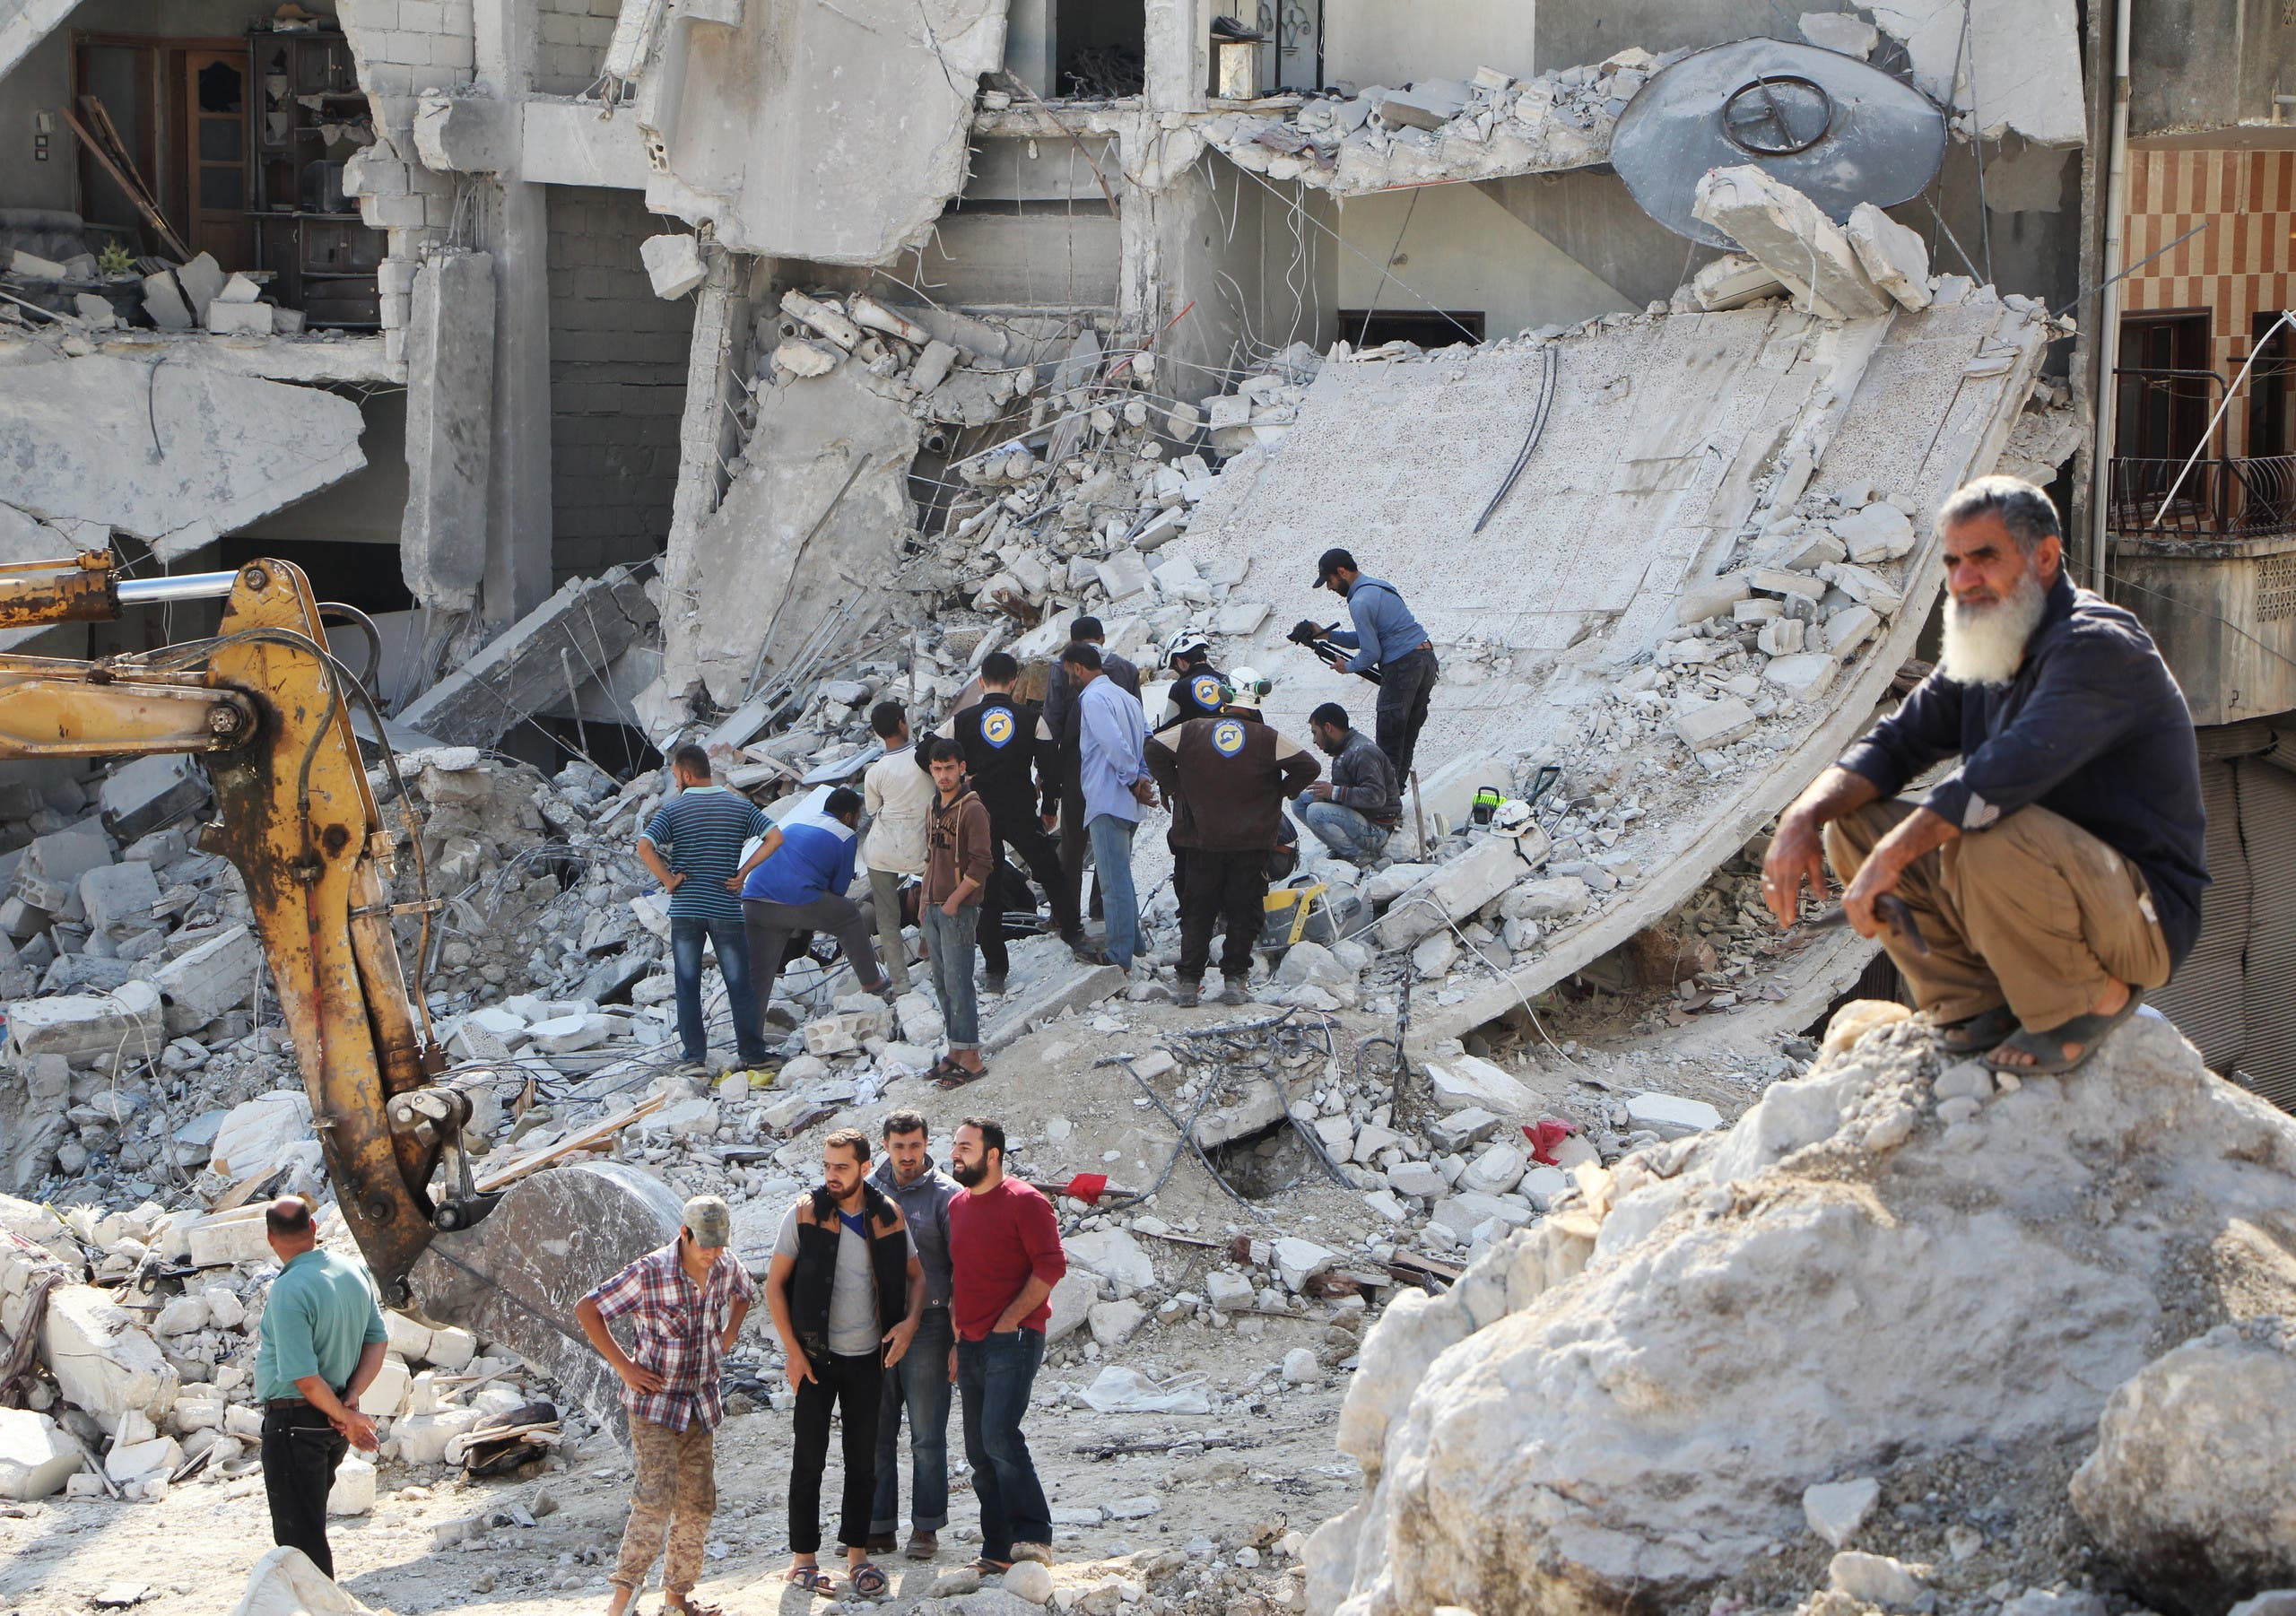 دمار بعد قصف استهدف إدلب - فرانس برس